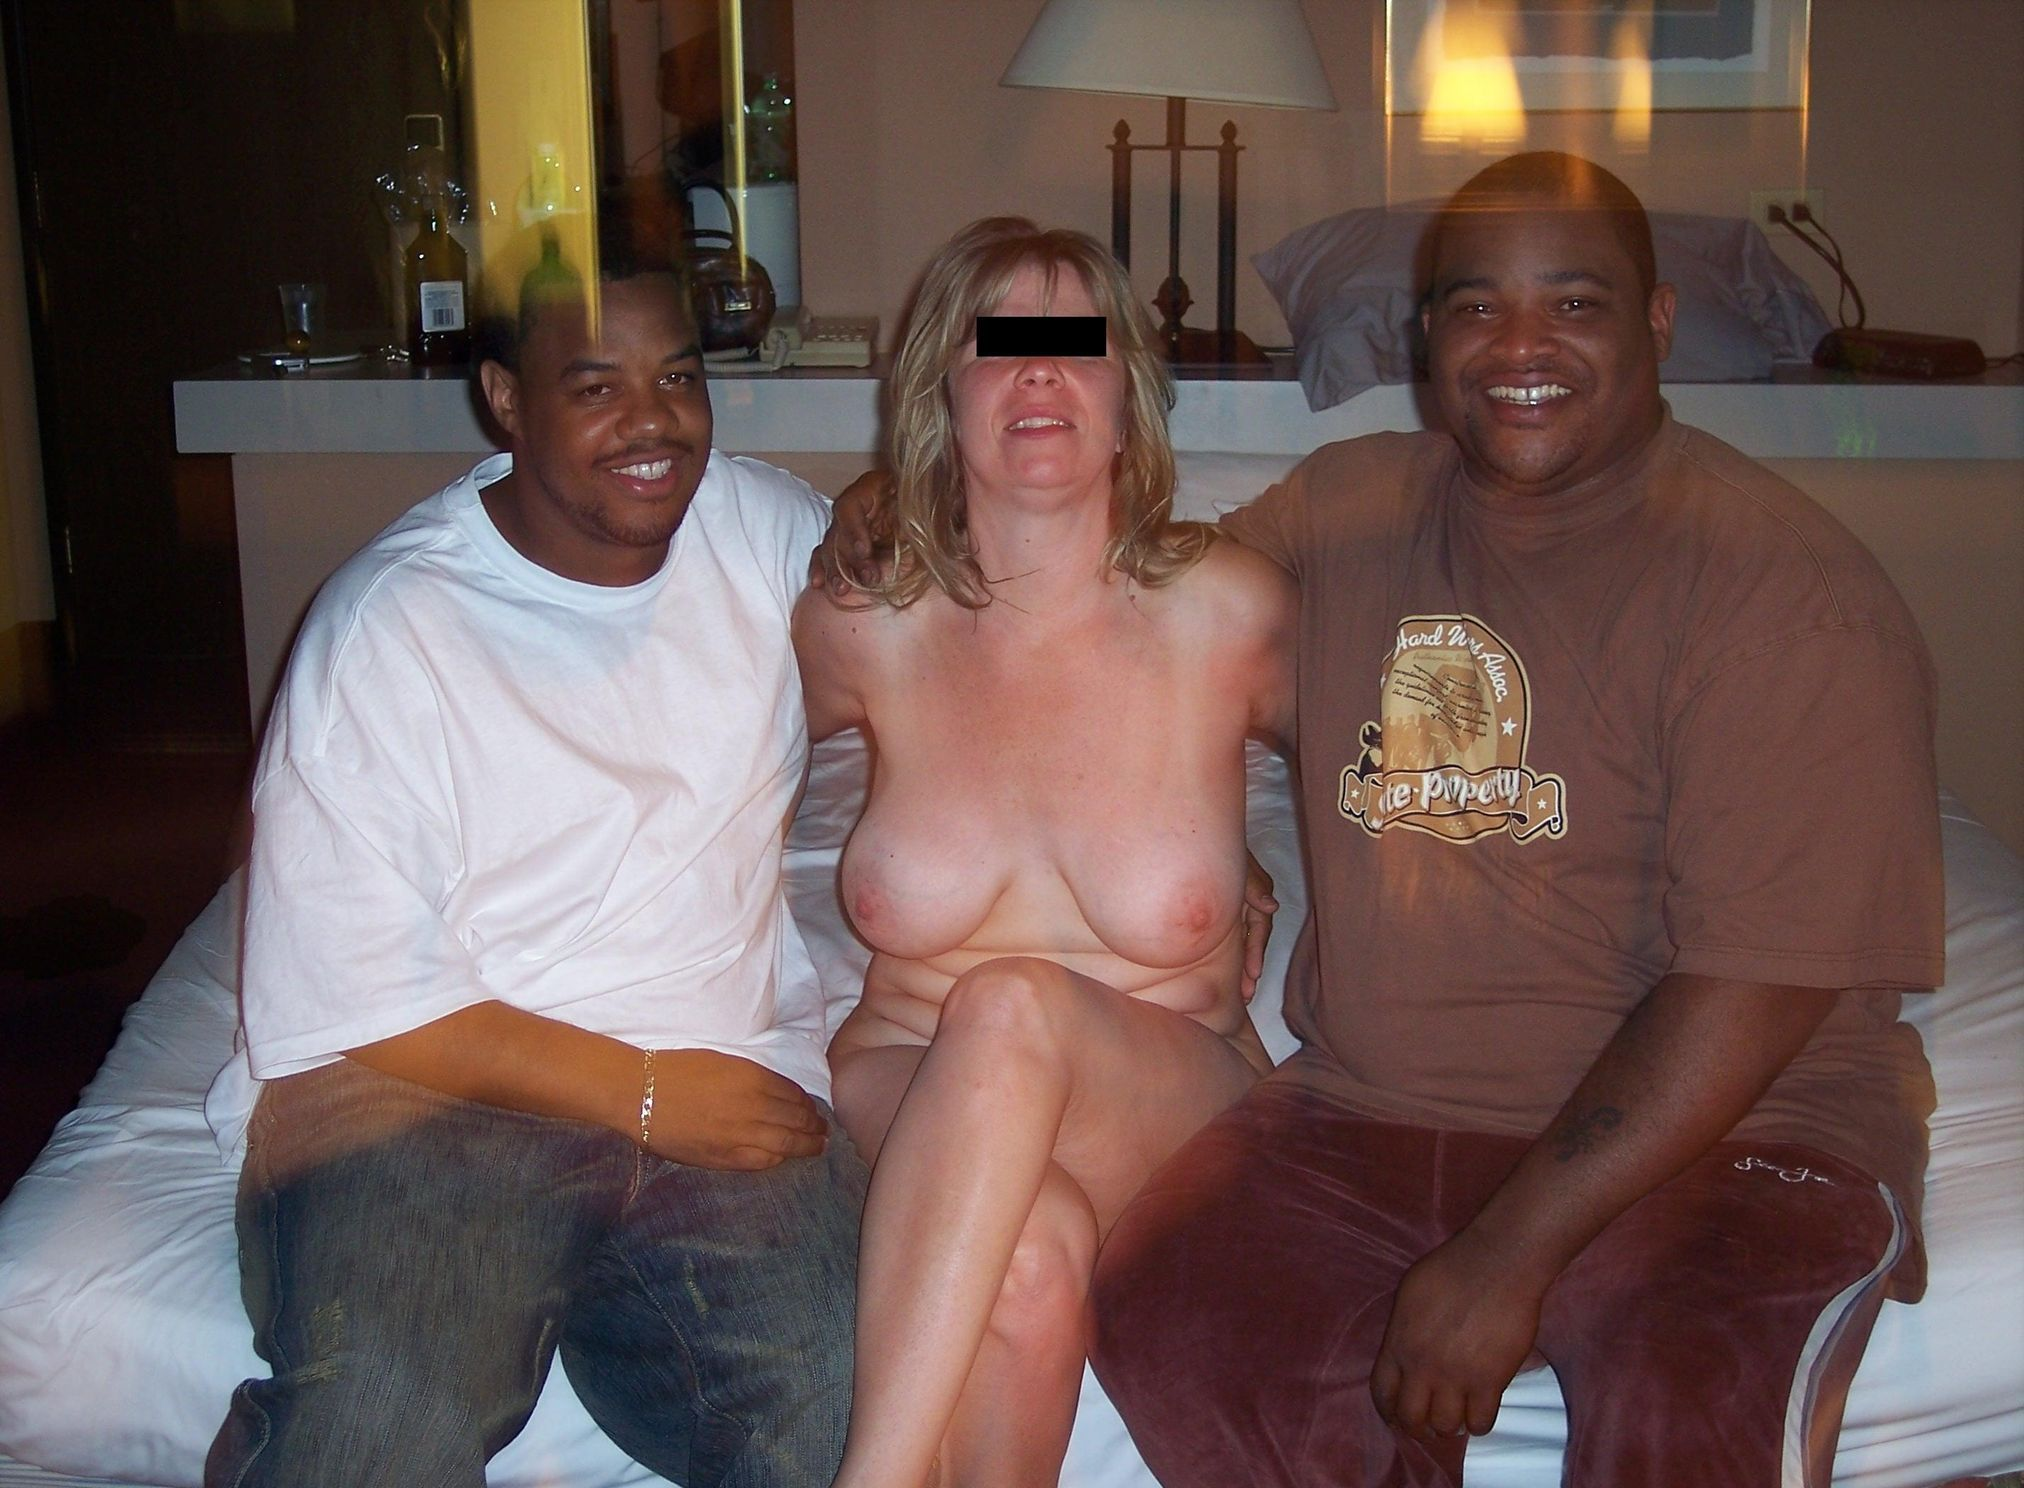 Amateur homemade interracial porn